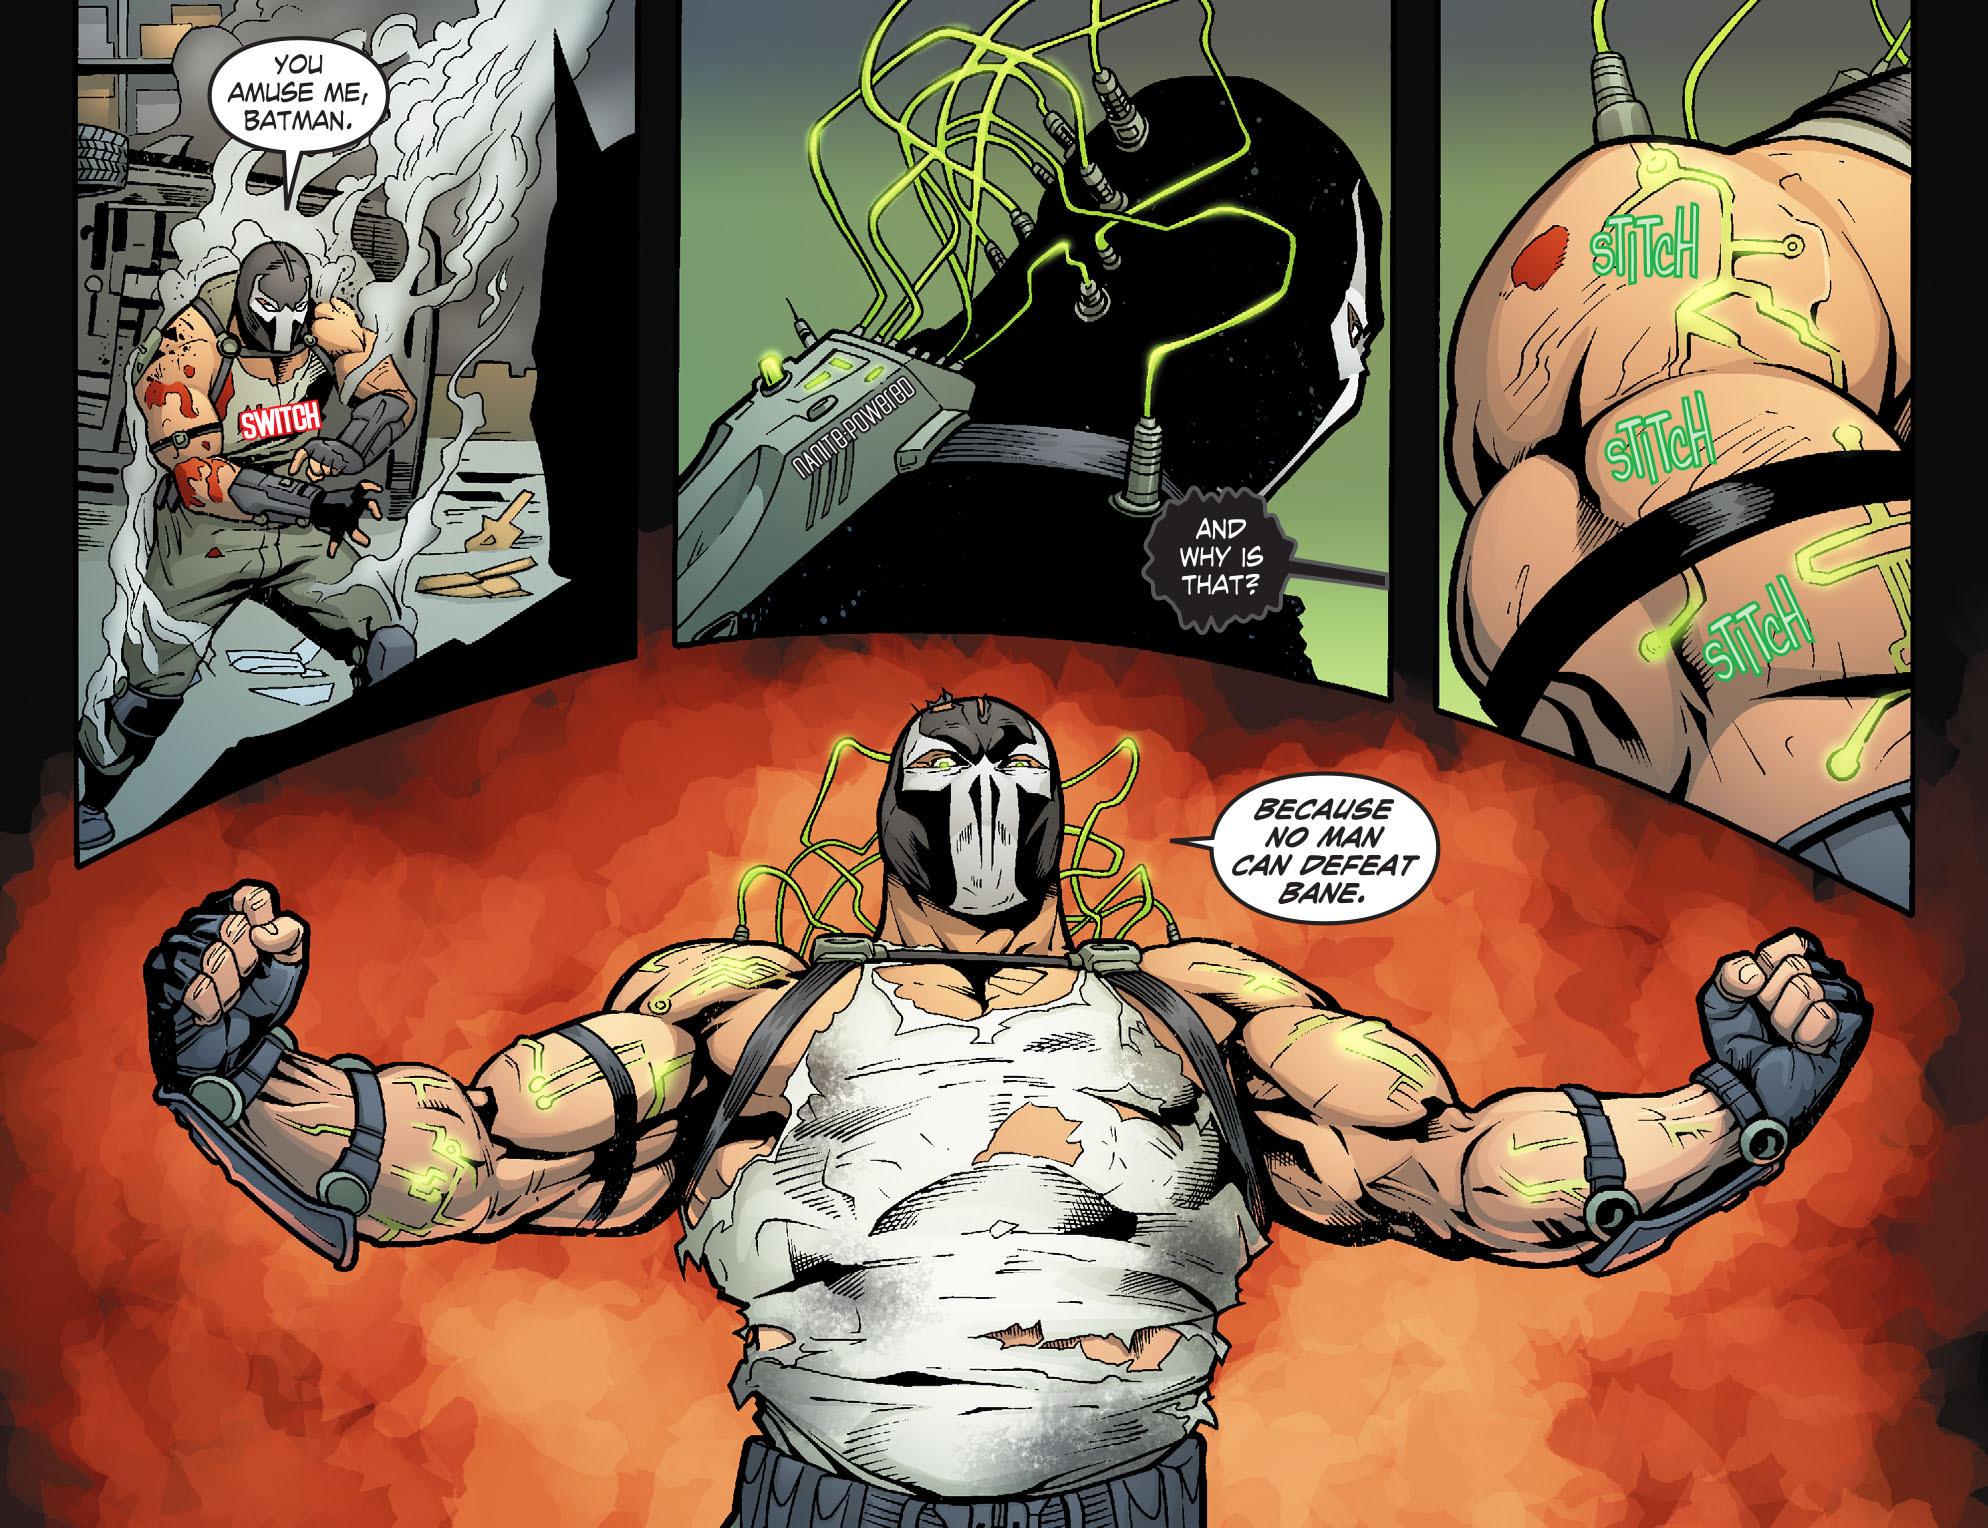 Read online Smallville: Alien comic -  Issue #4 - 10